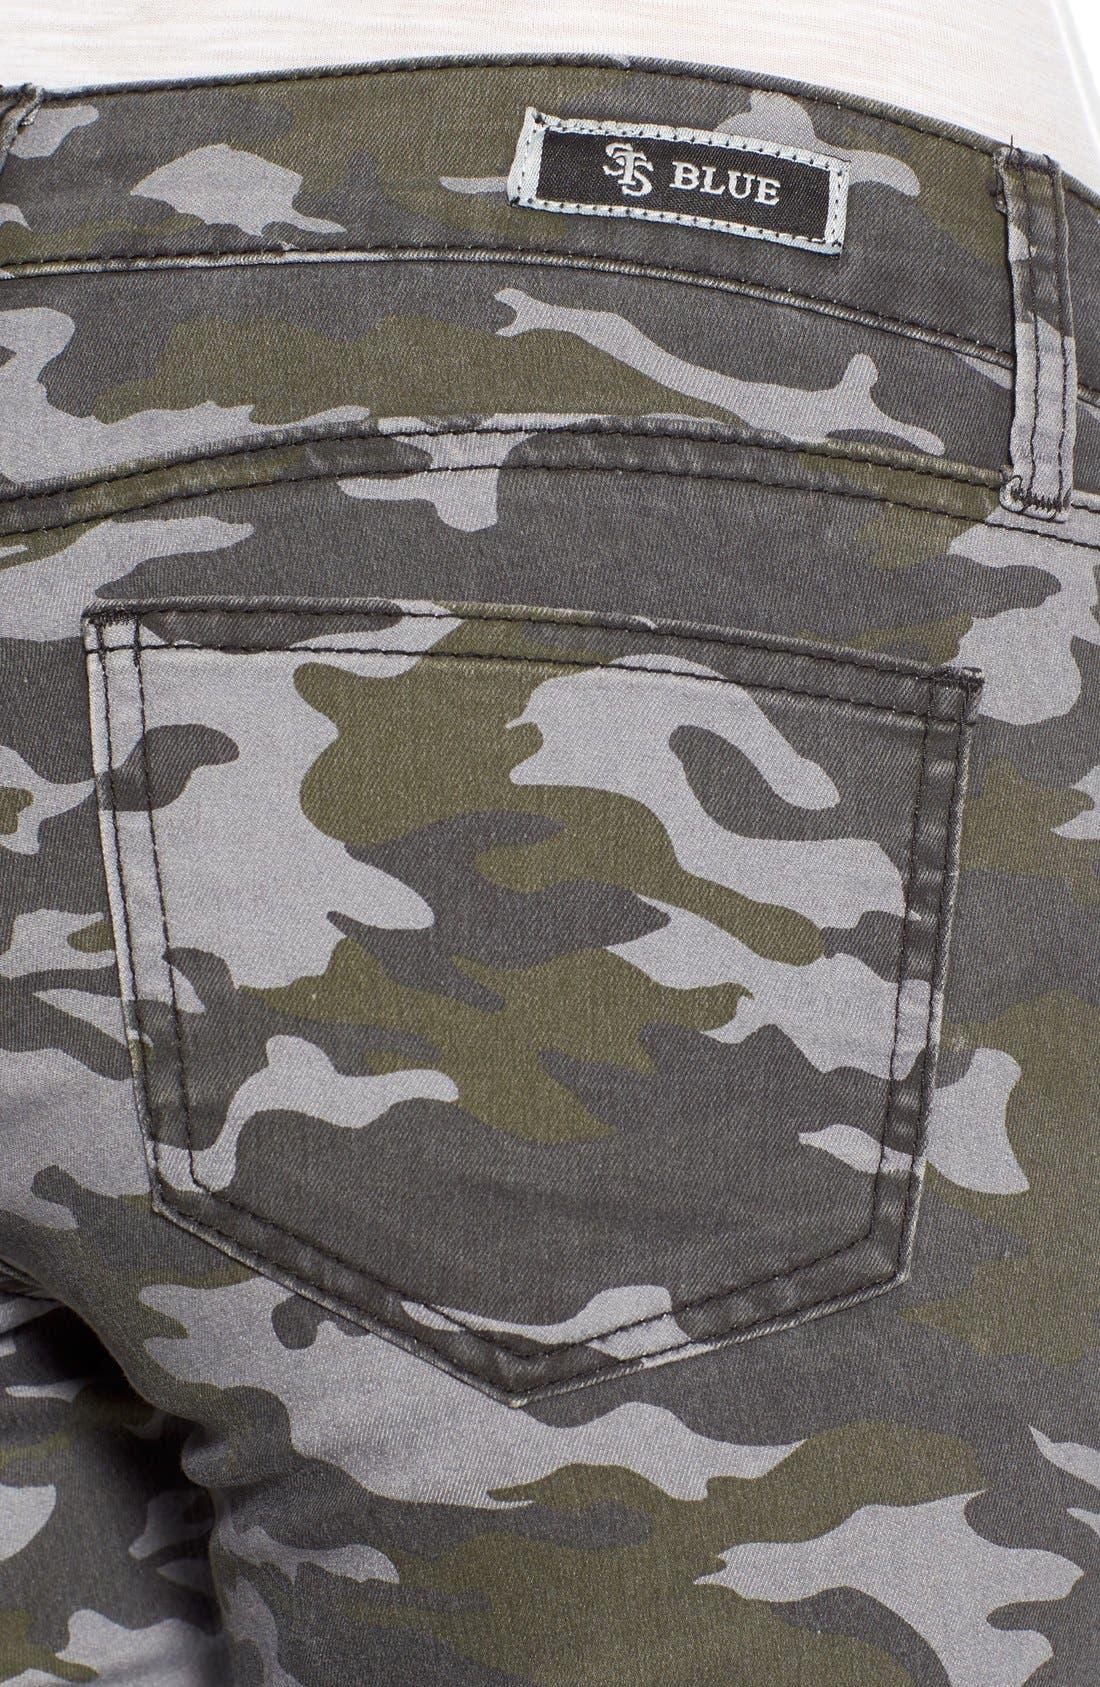 Camo Print Cargo Pants,                             Alternate thumbnail 5, color,                             317